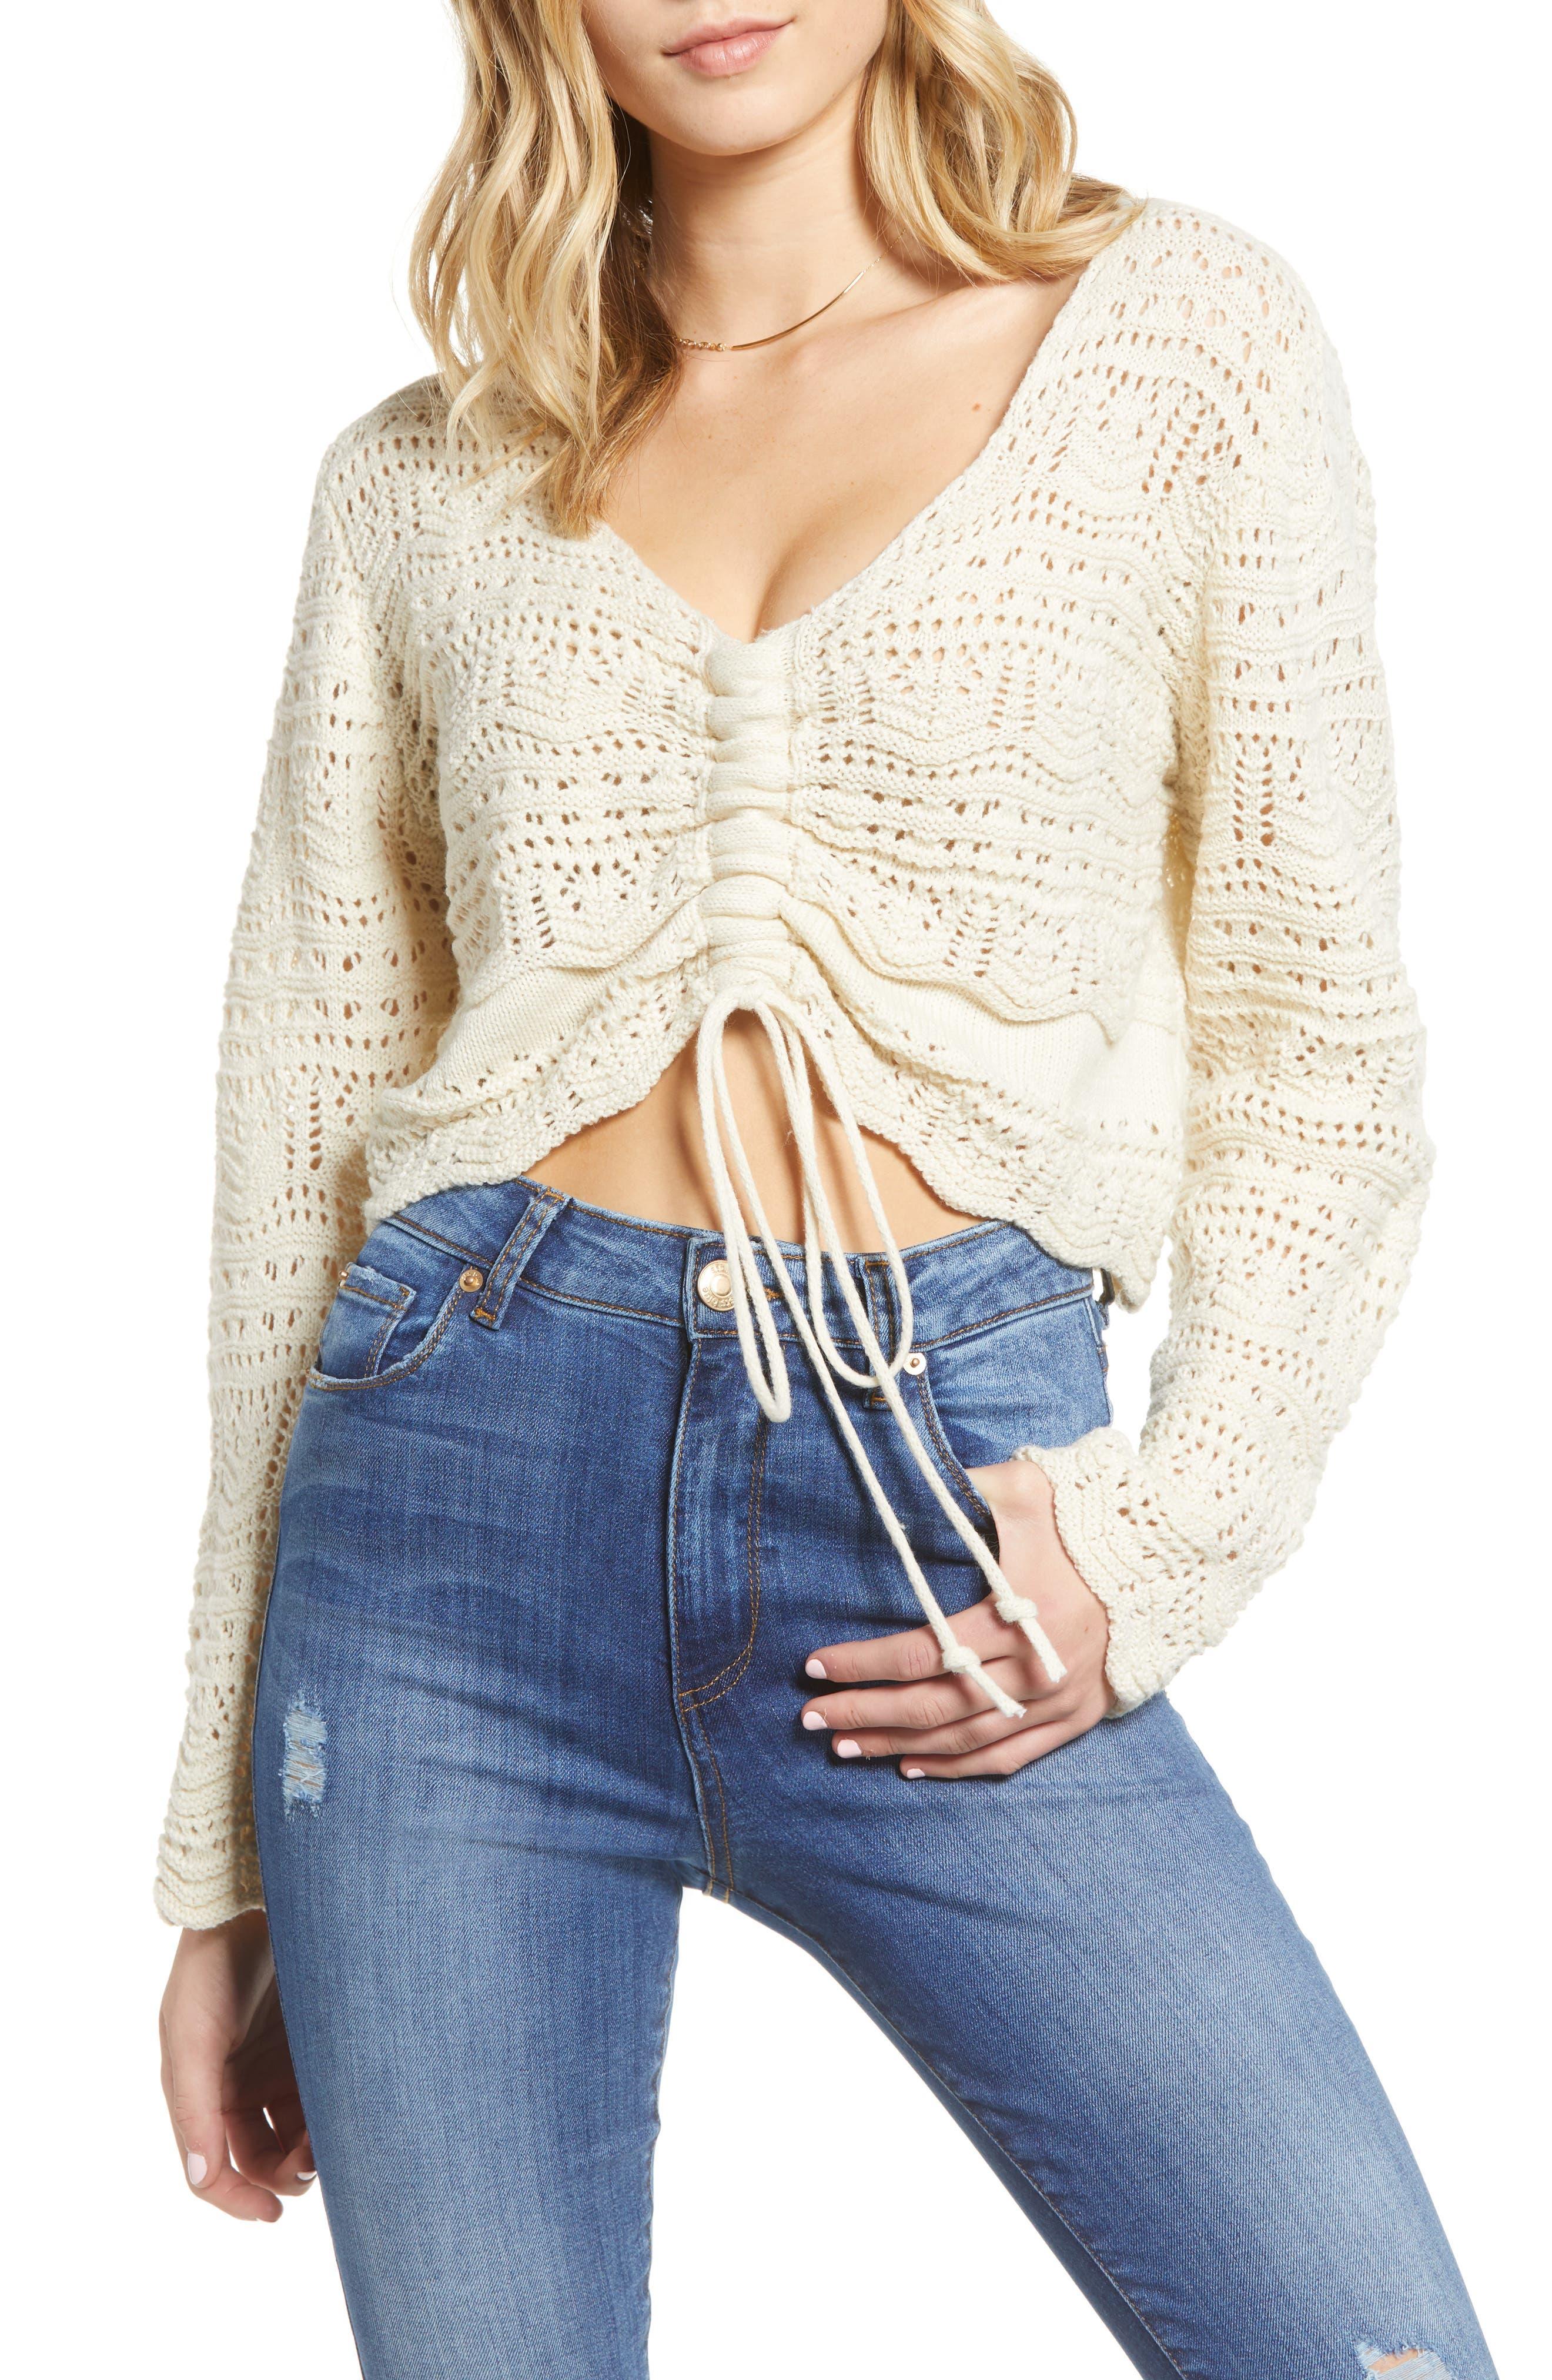 Women's 70s Shirts, Blouses, Hippie Tops Womens Moon River Pointelle Crop Sweater $65.00 AT vintagedancer.com